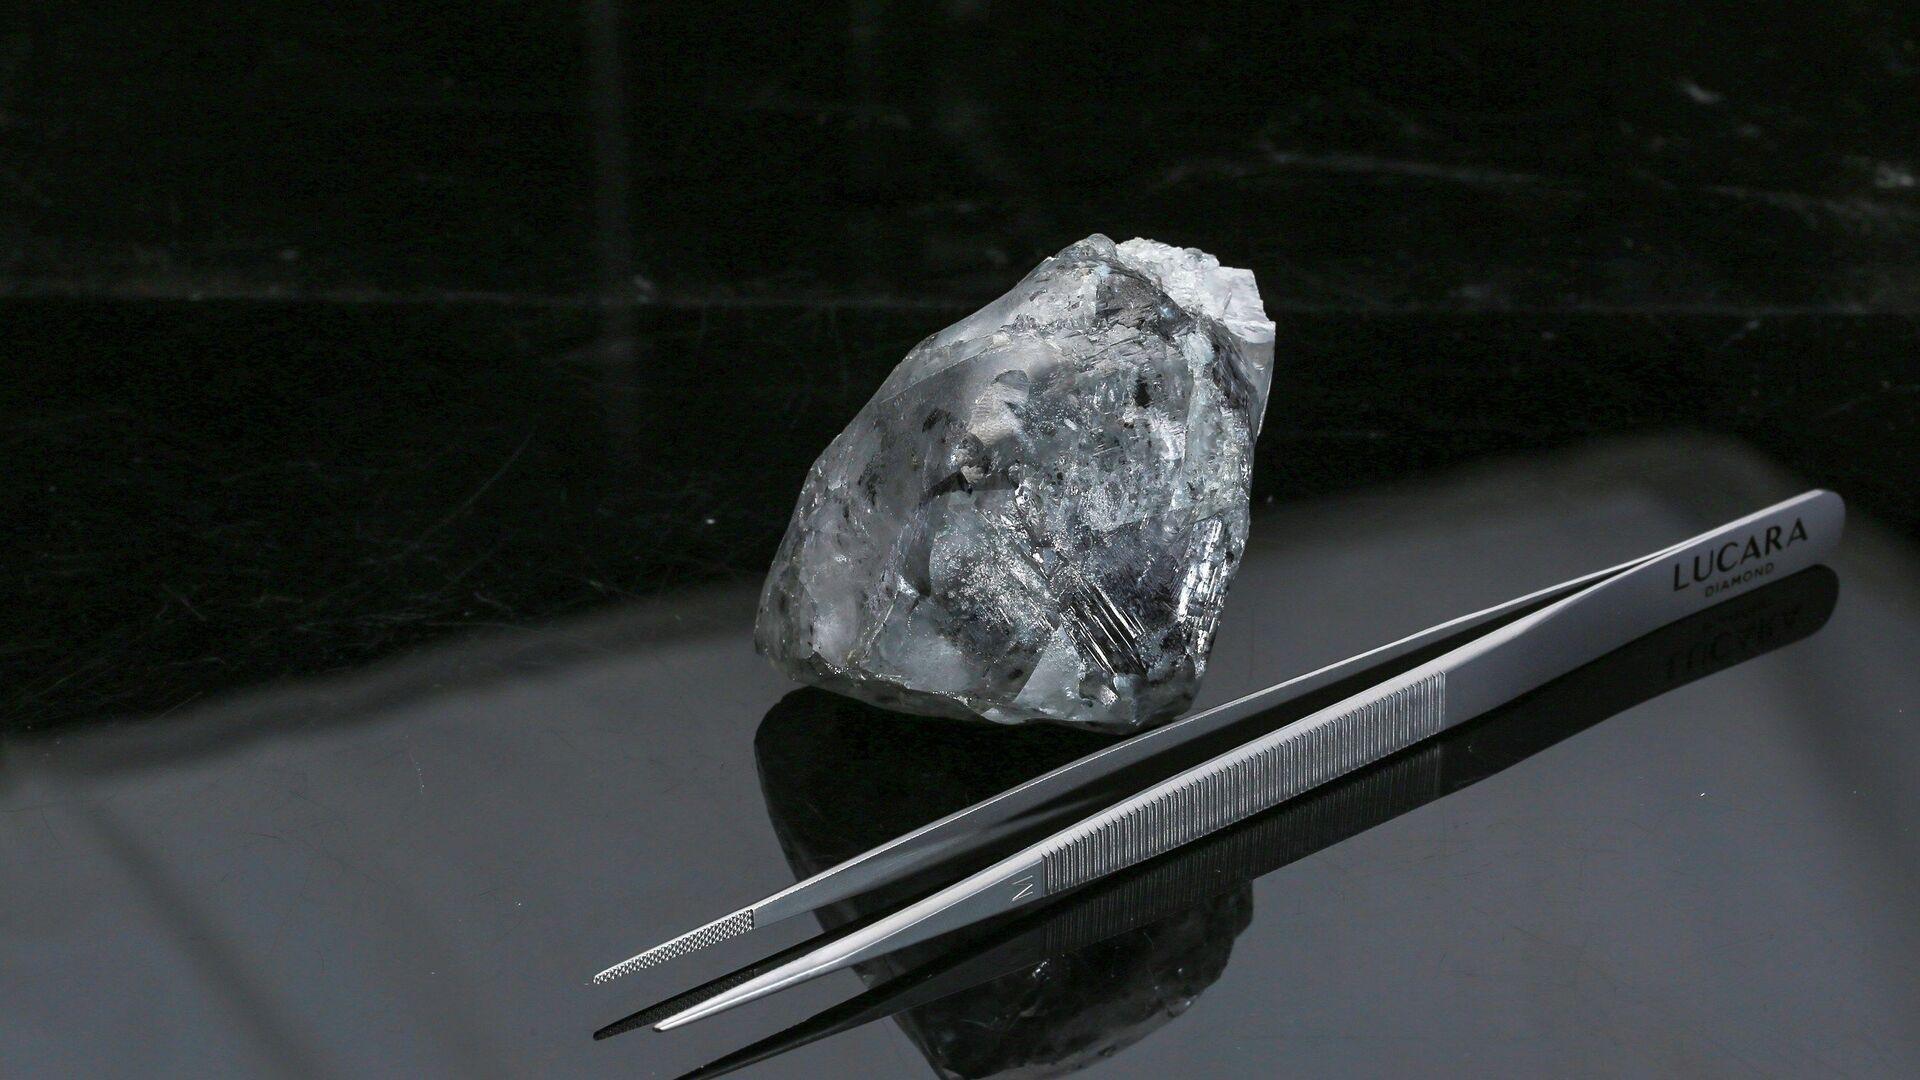 El diamante blanco de 998 quilates encontrado en la mina de Karowe en Botswana - Sputnik Mundo, 1920, 17.02.2021